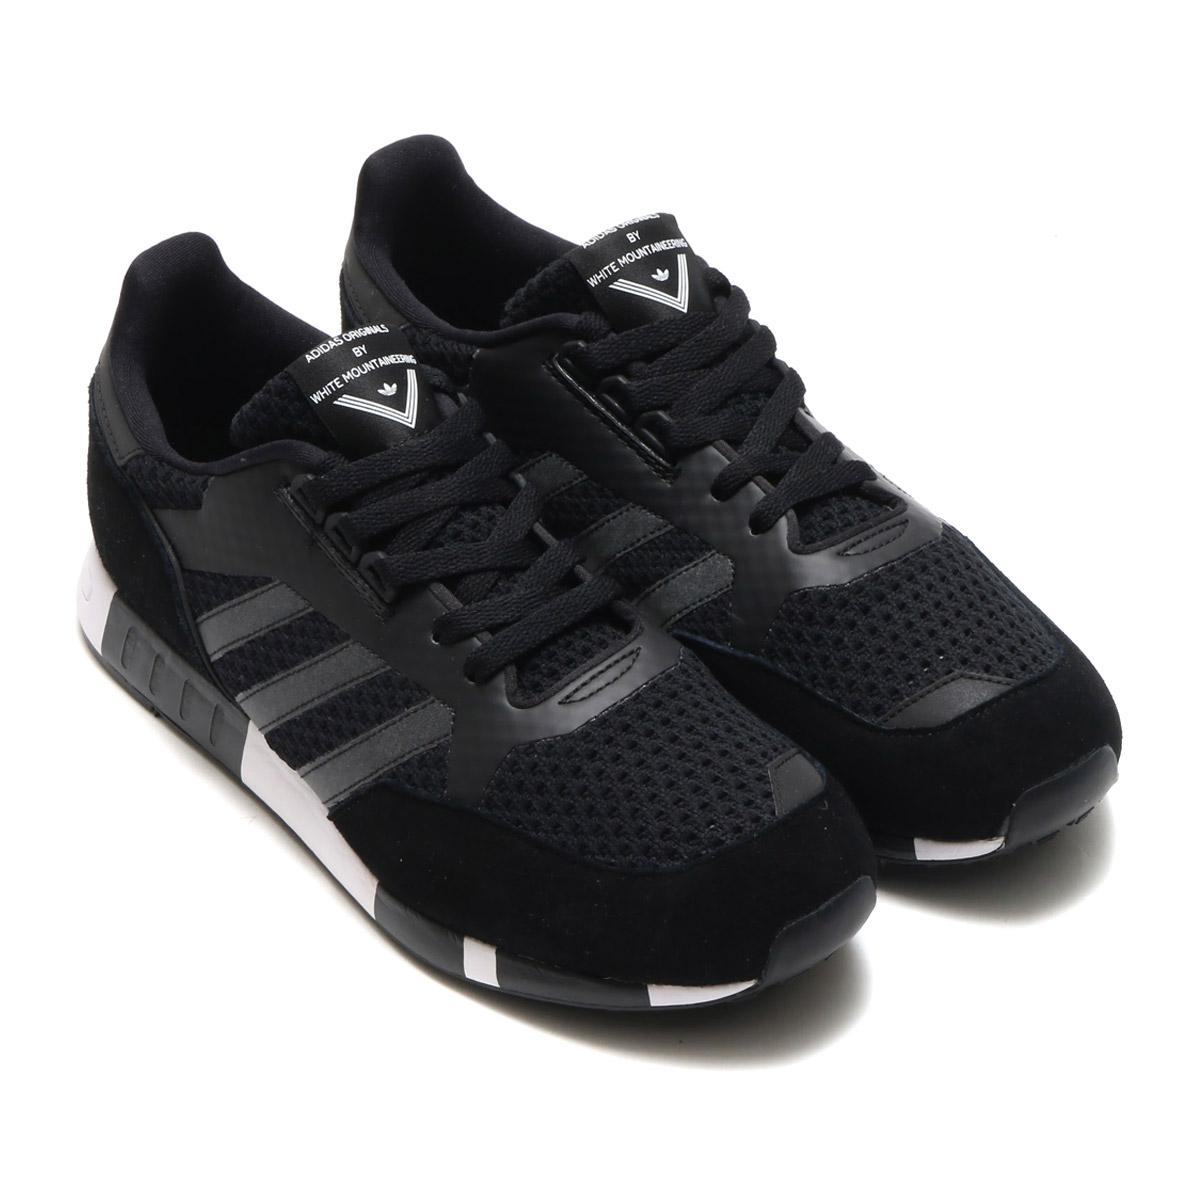 adidas Originals WM BOSTON SUPER PK(アディダス オリジナルス WM ボストン スーパー PK)Core Black/Core Black/Running White【メンズ スニーカー】17FW-I